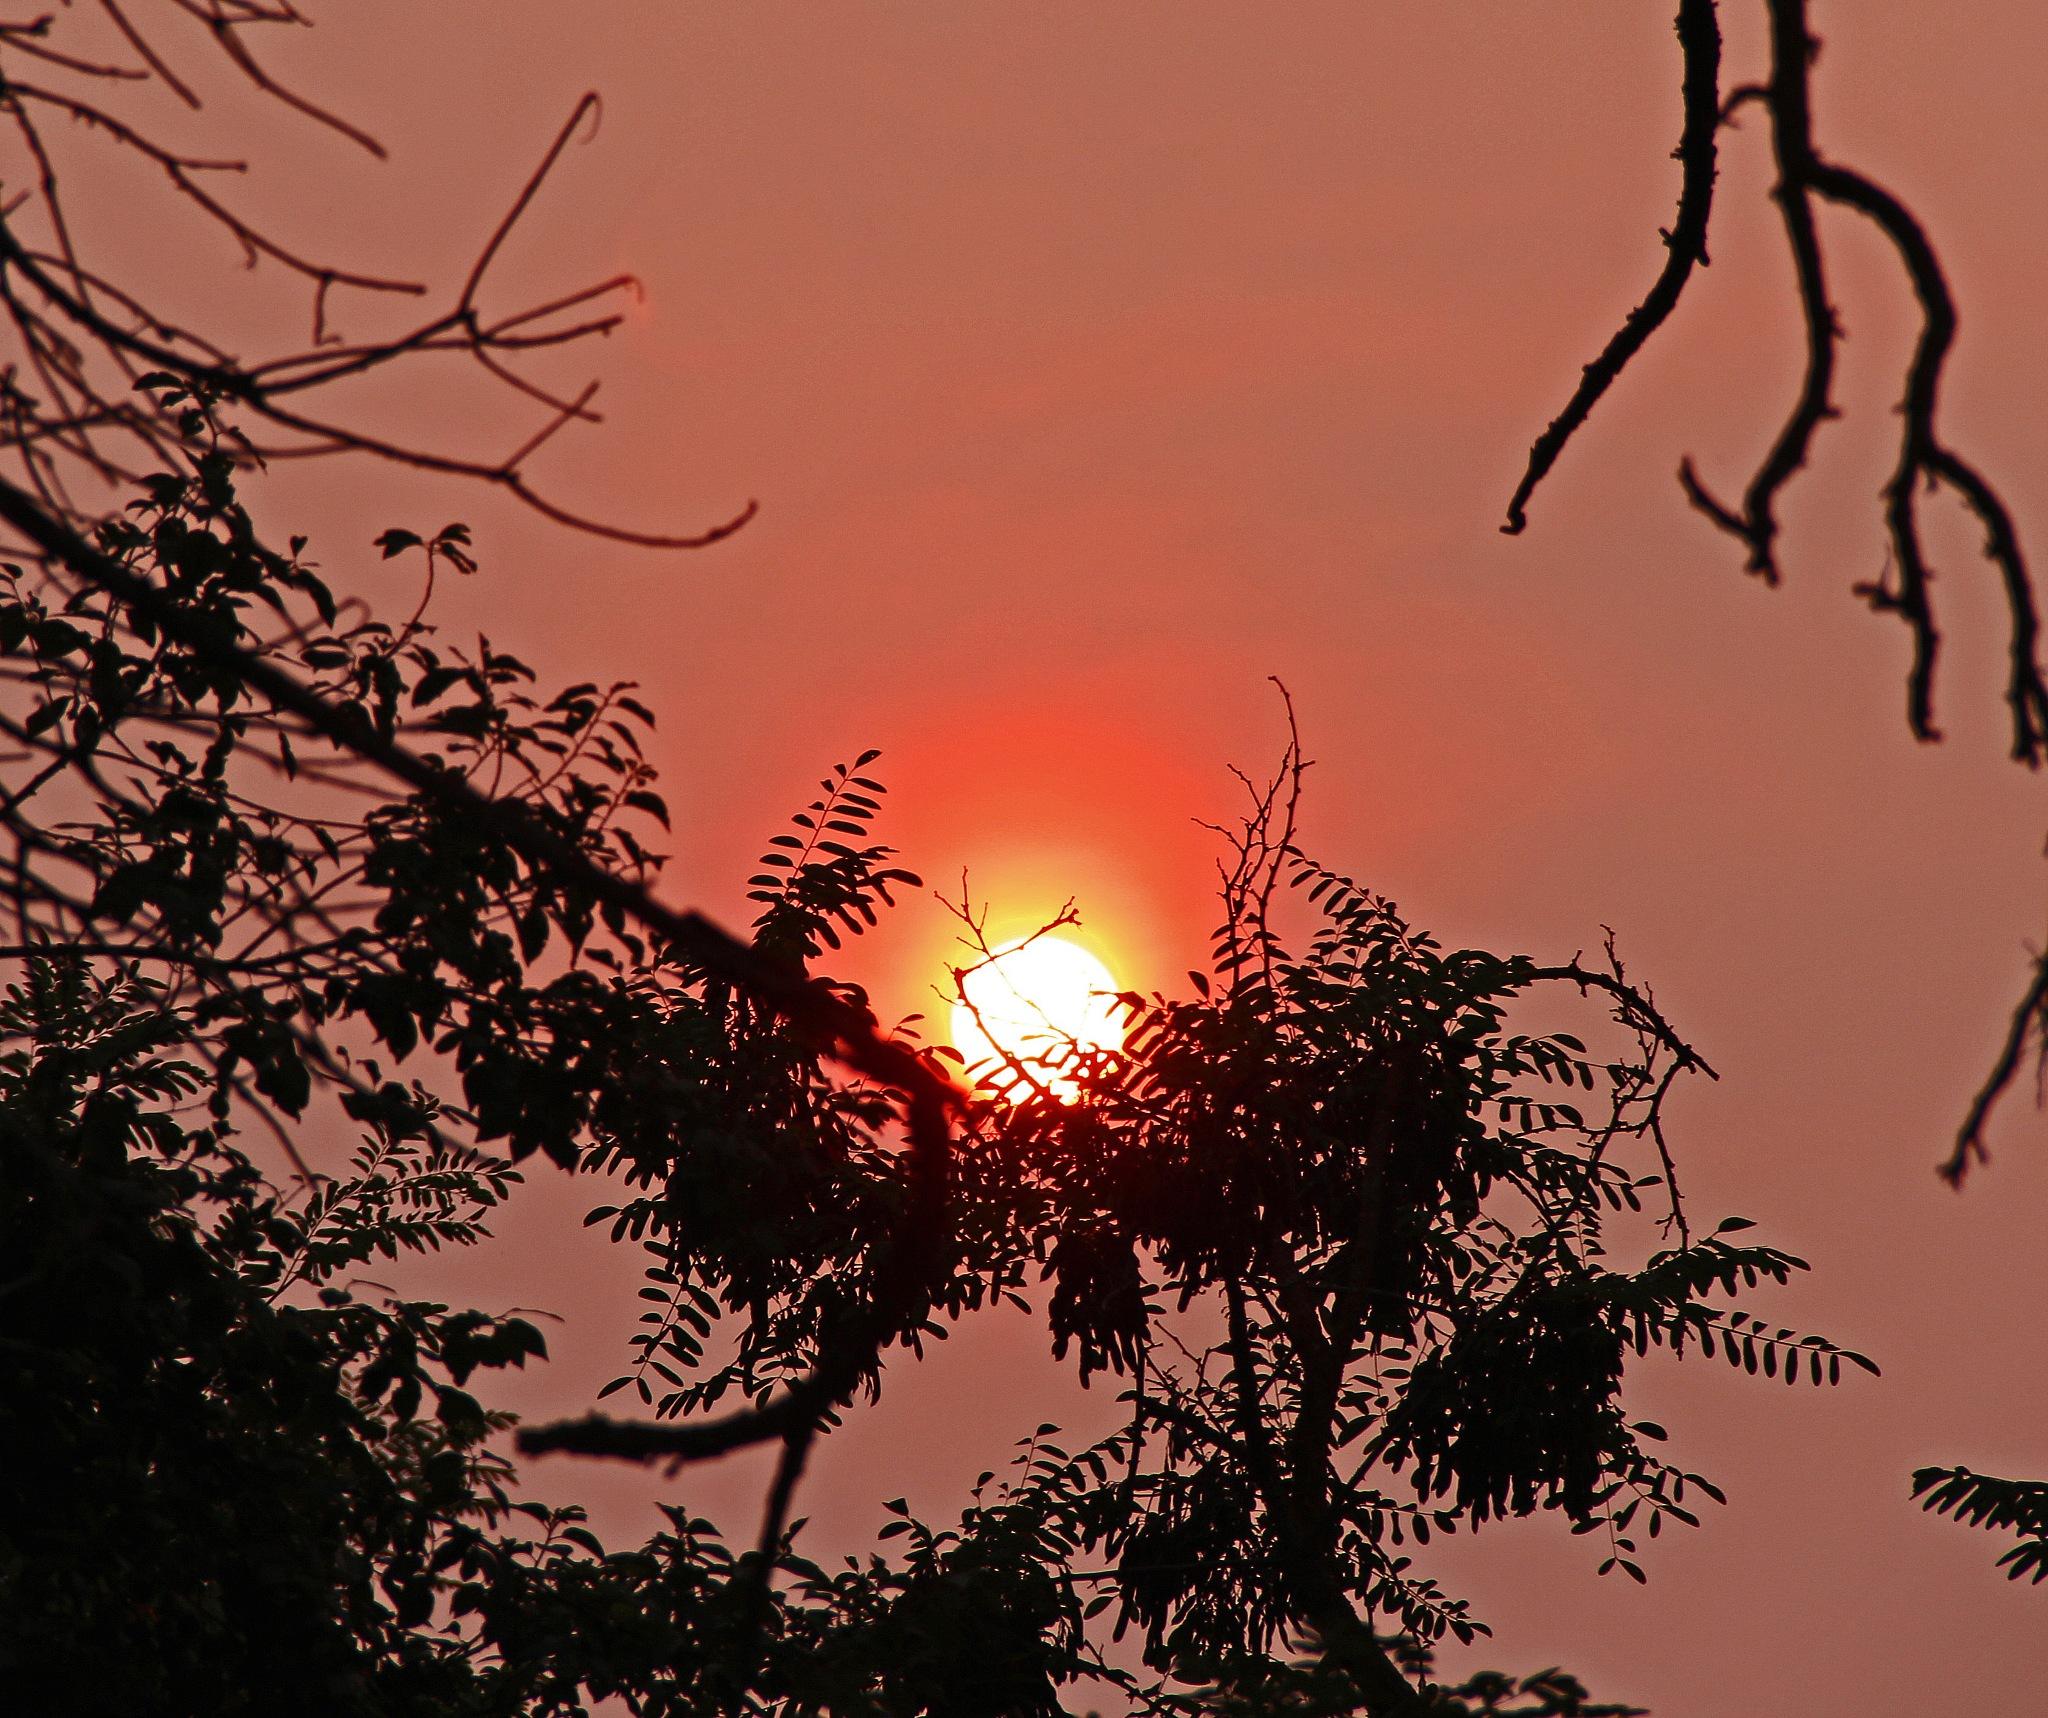 Smoked Sun 2 by christena.anderson